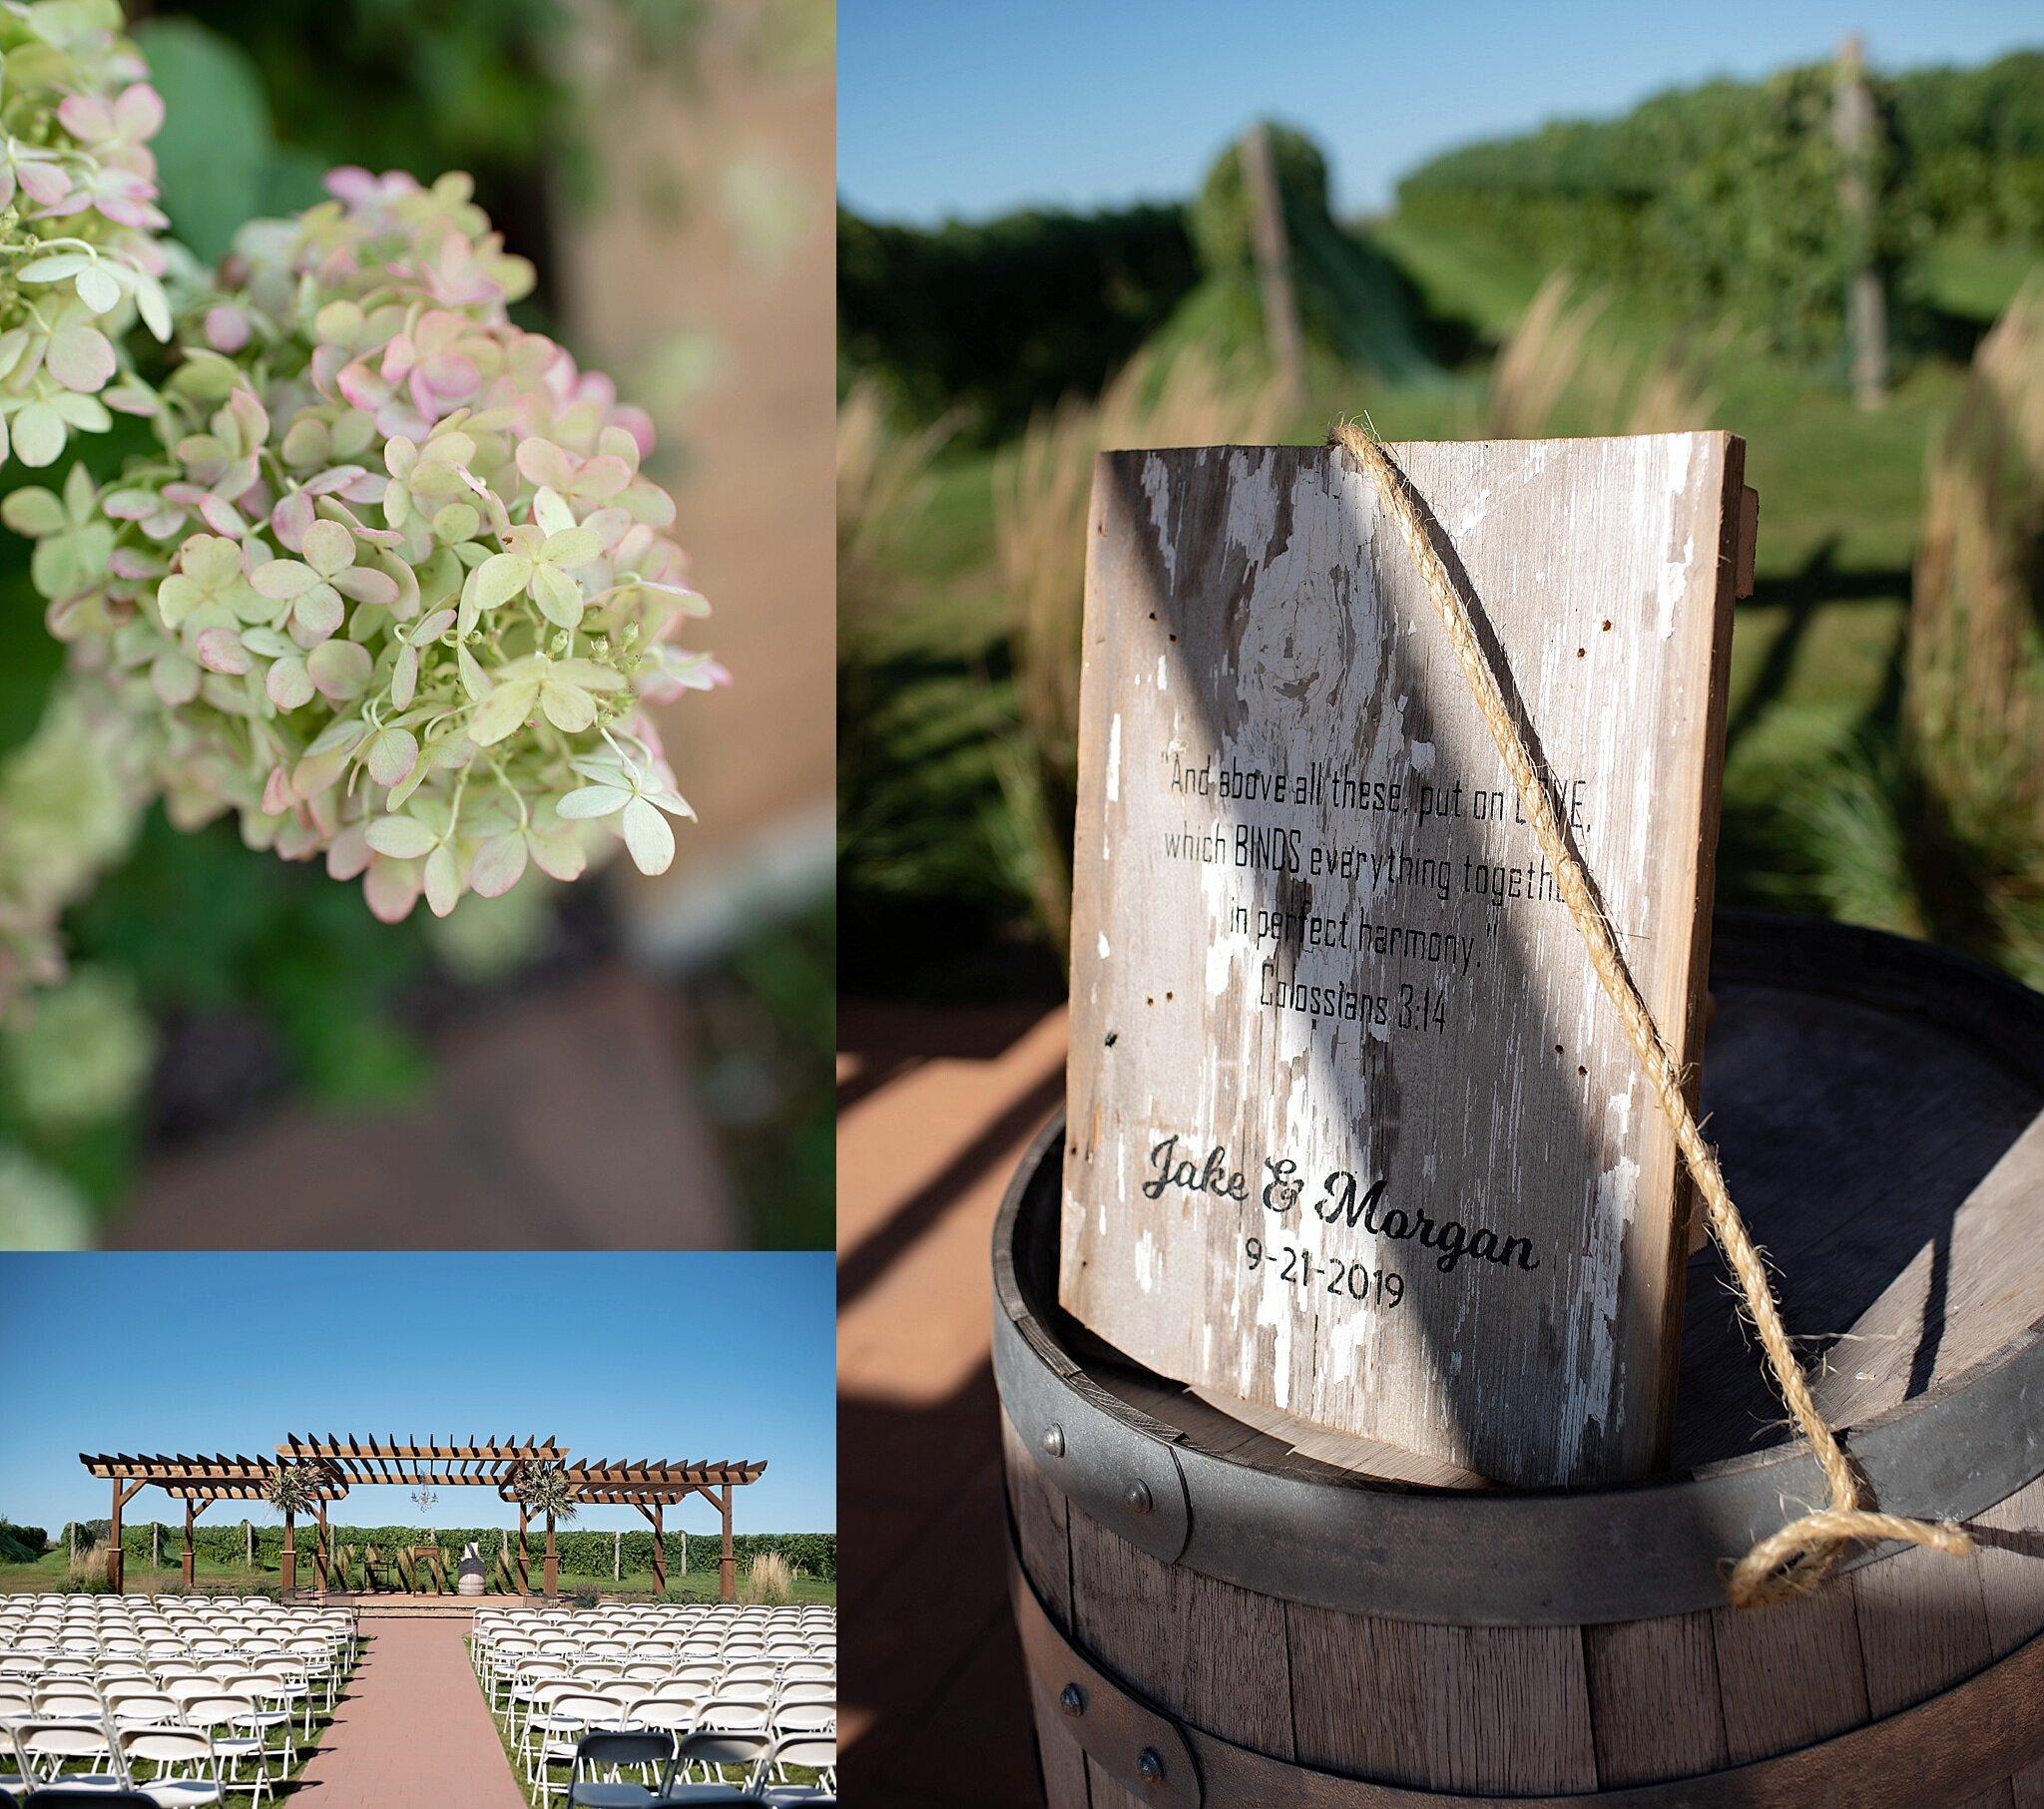 calico skies vineyard and winery wedding inwood iowa